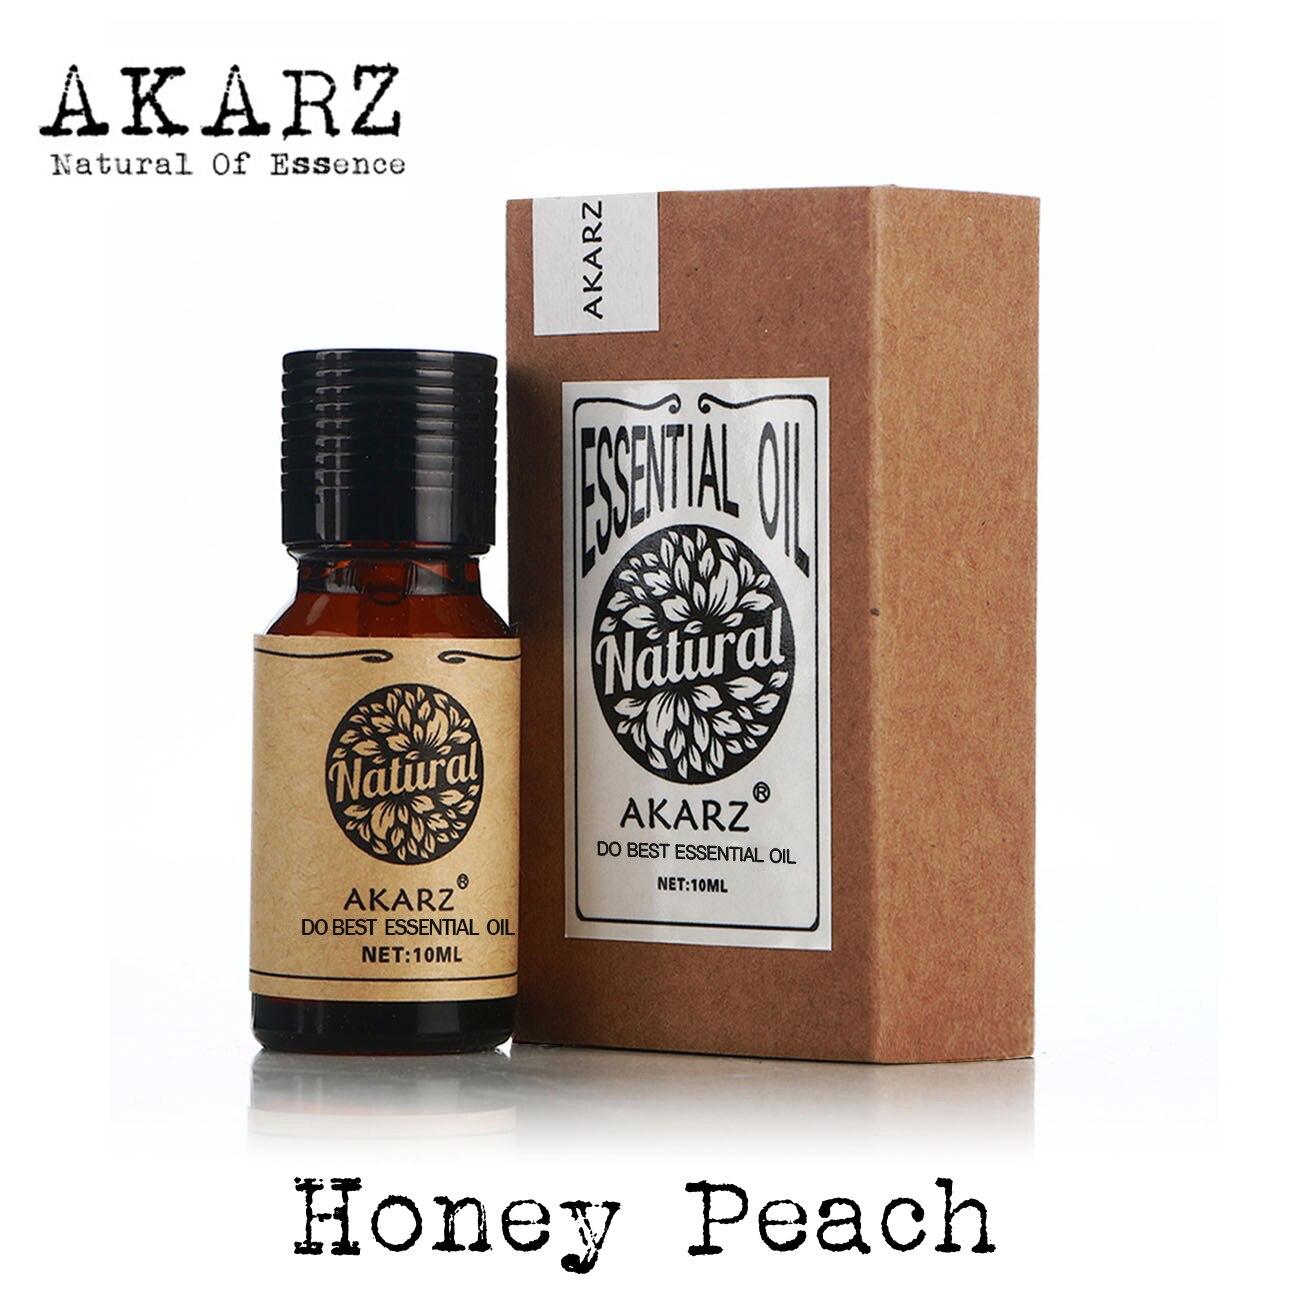 AKARZ Famous Brand Natural Honey Peach Essential Oil Smooth Skin Relax Pleasant Mood Honey Peach Oil